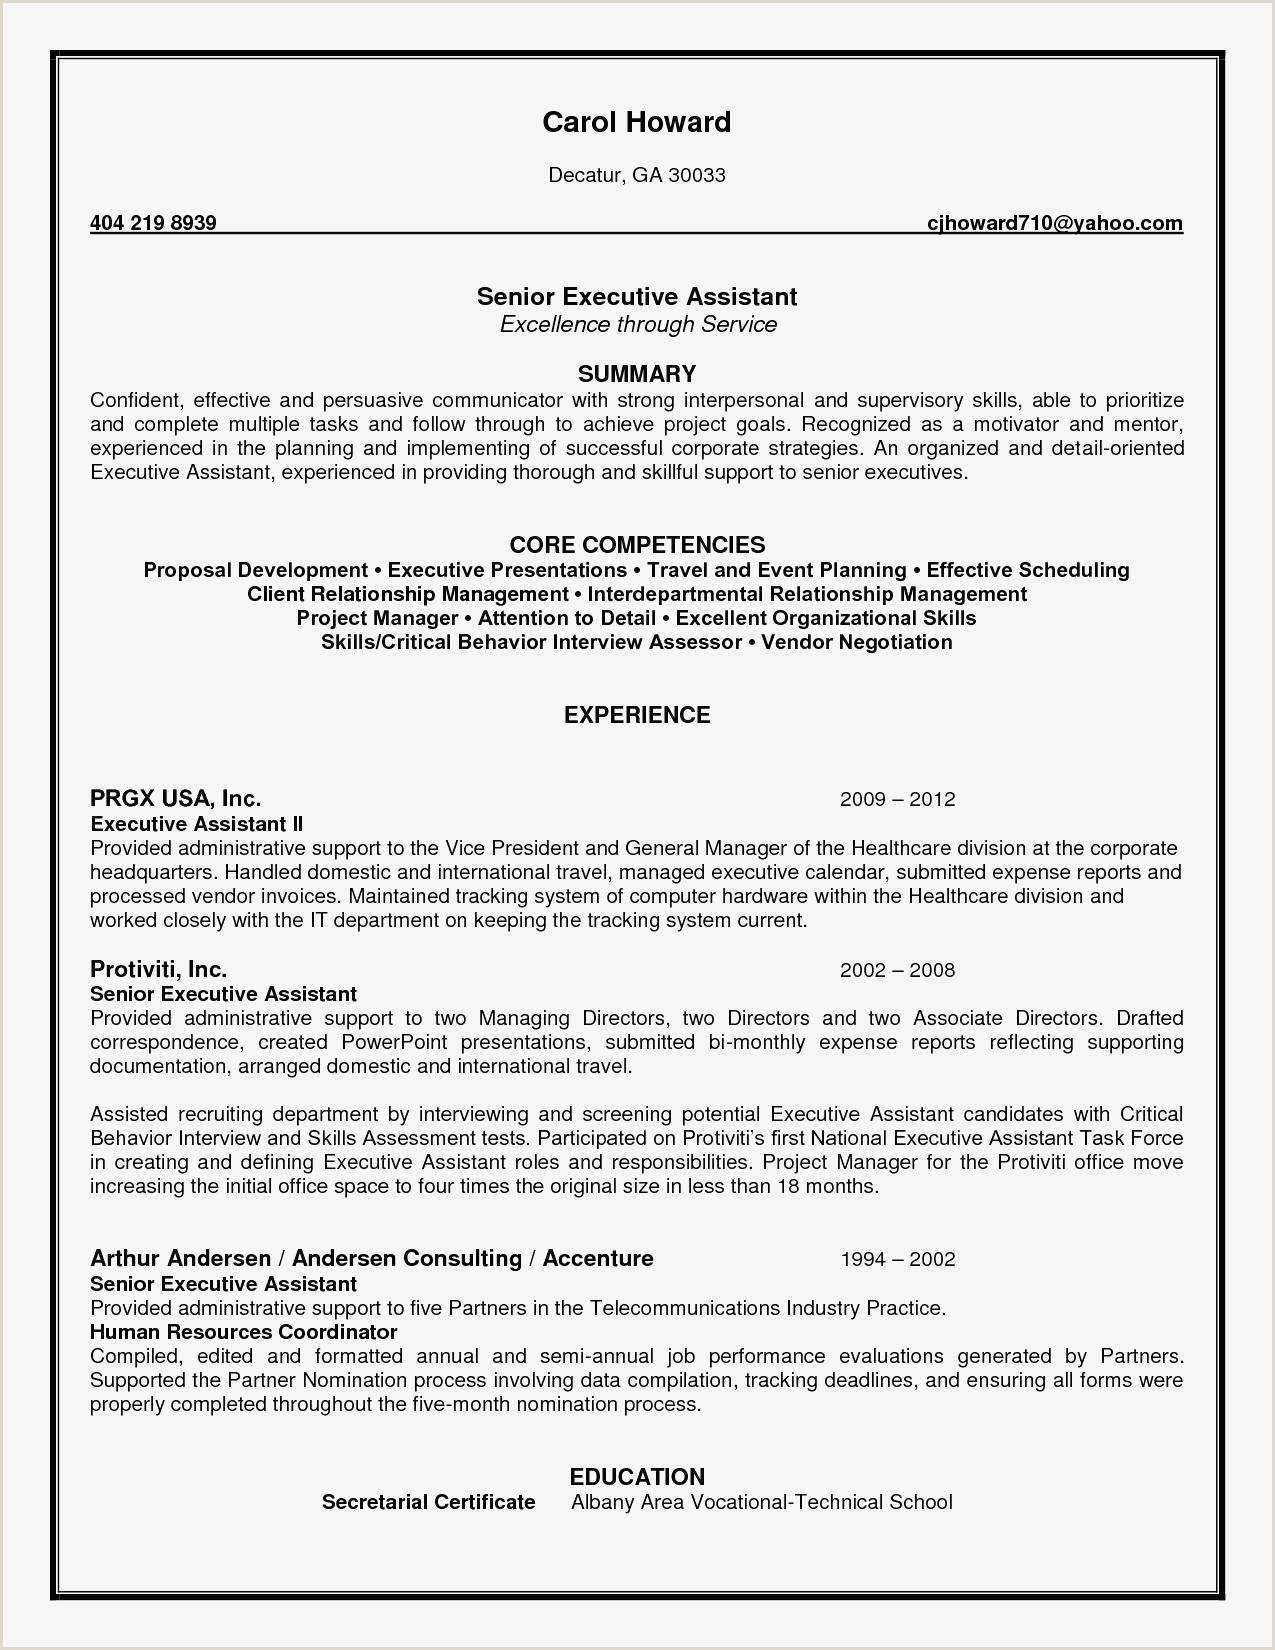 Resume format for Job Experience Cv Cadre Dirigeant Magnifique Simple Job Resume Examples